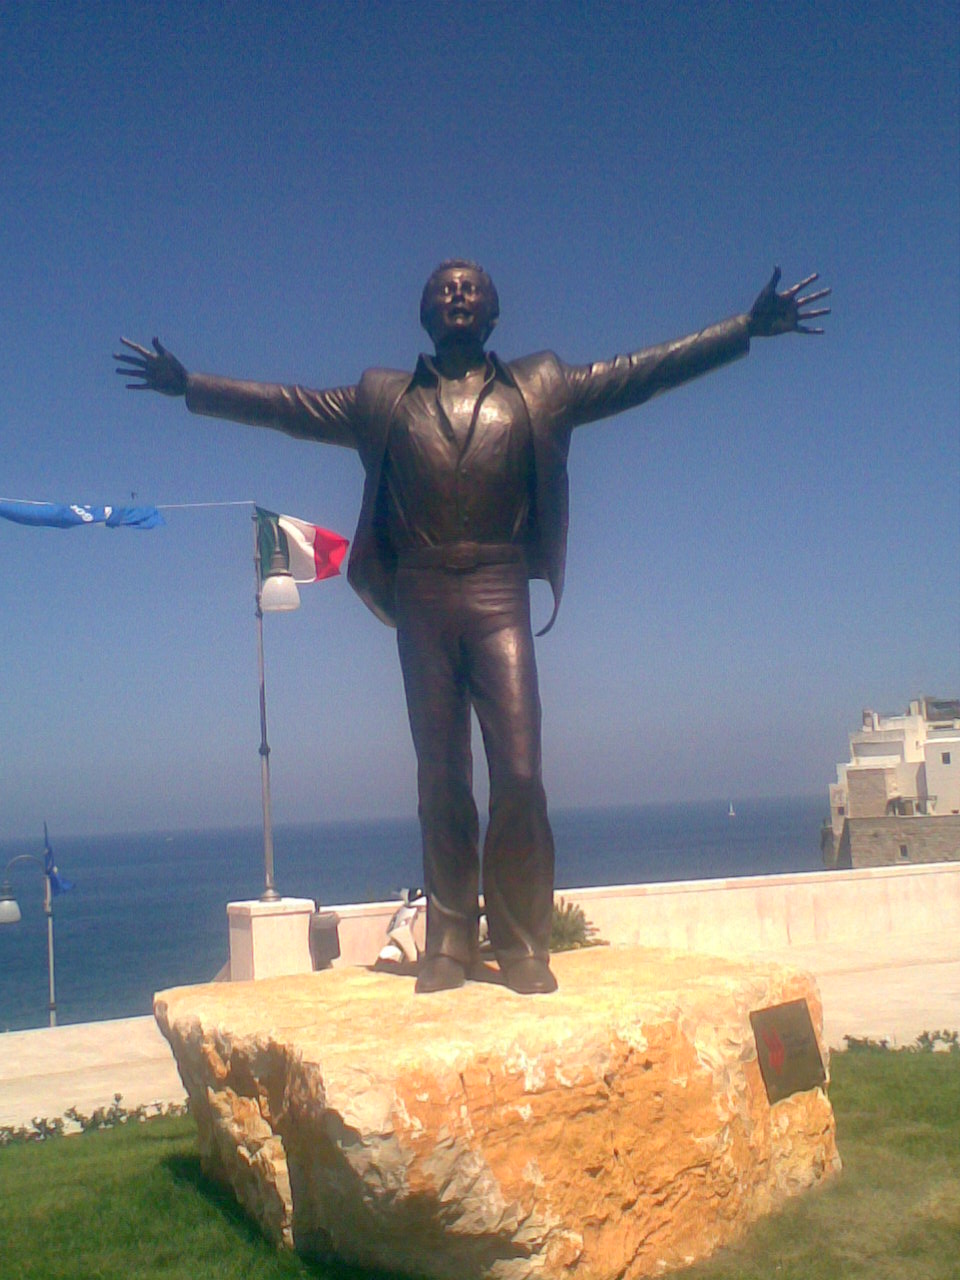 San-Remo-Festival 1958: Heute blau und morgen blau